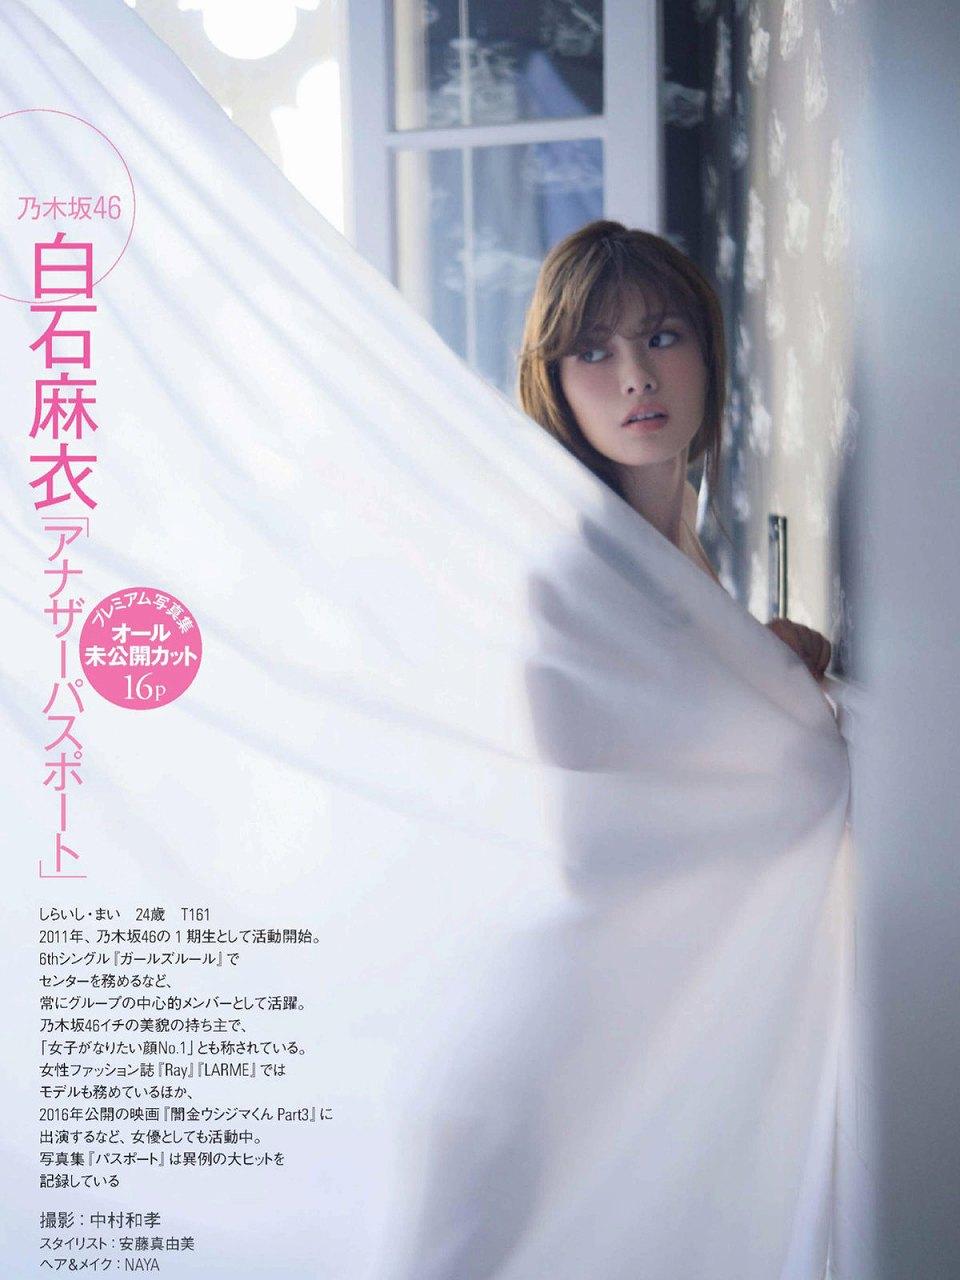 「FRIDAY(フライデー) 2017年 3/17 号」白石麻衣の下着グラビア